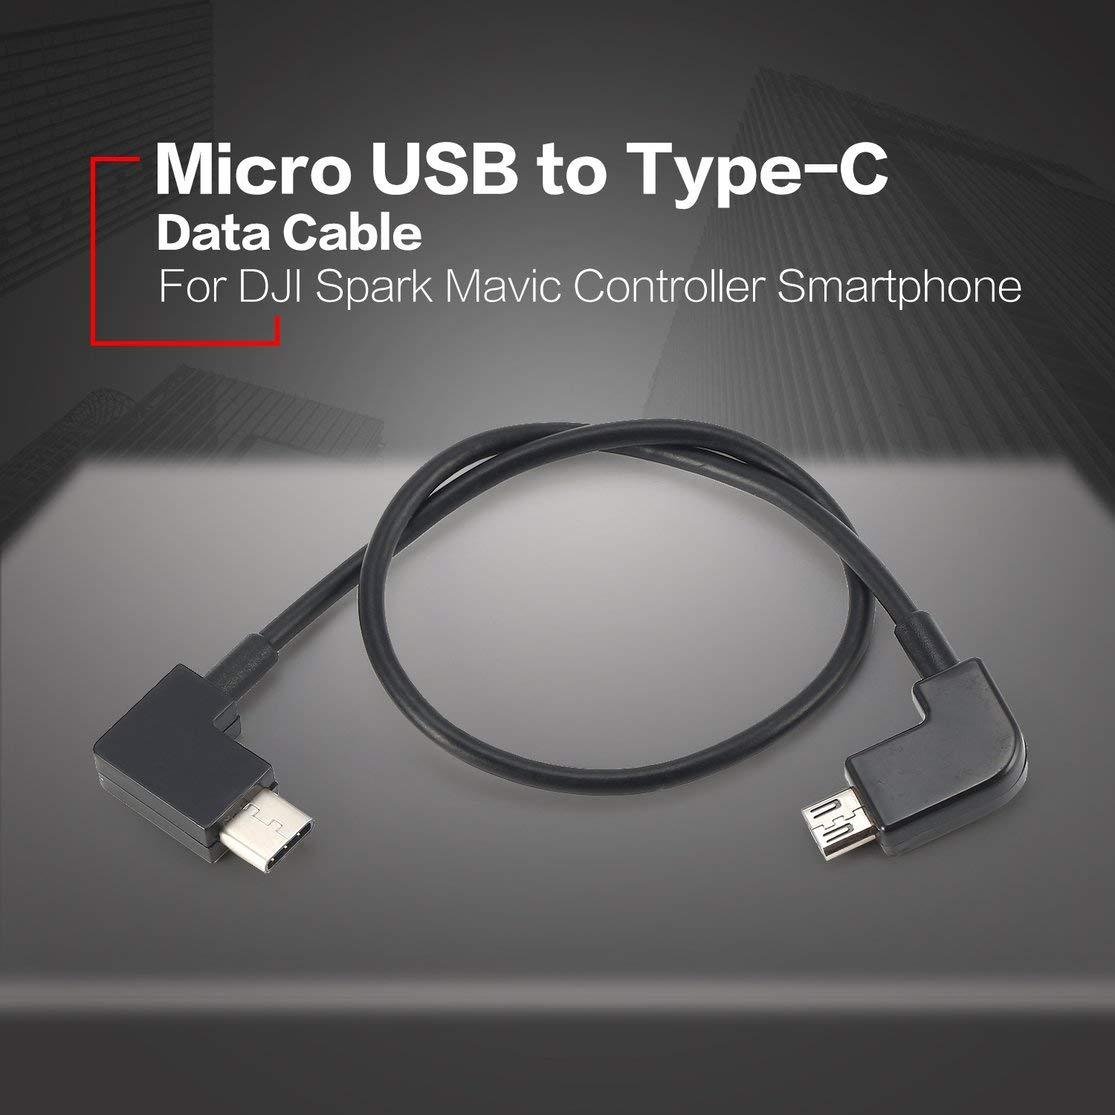 LouiseEvel215 Datenkabel f/ür DJI Spark Mavic Pro Platinum Luftregler Micro-USB auf Typ C Port Adapter Line f/ür Smartphone Tablet